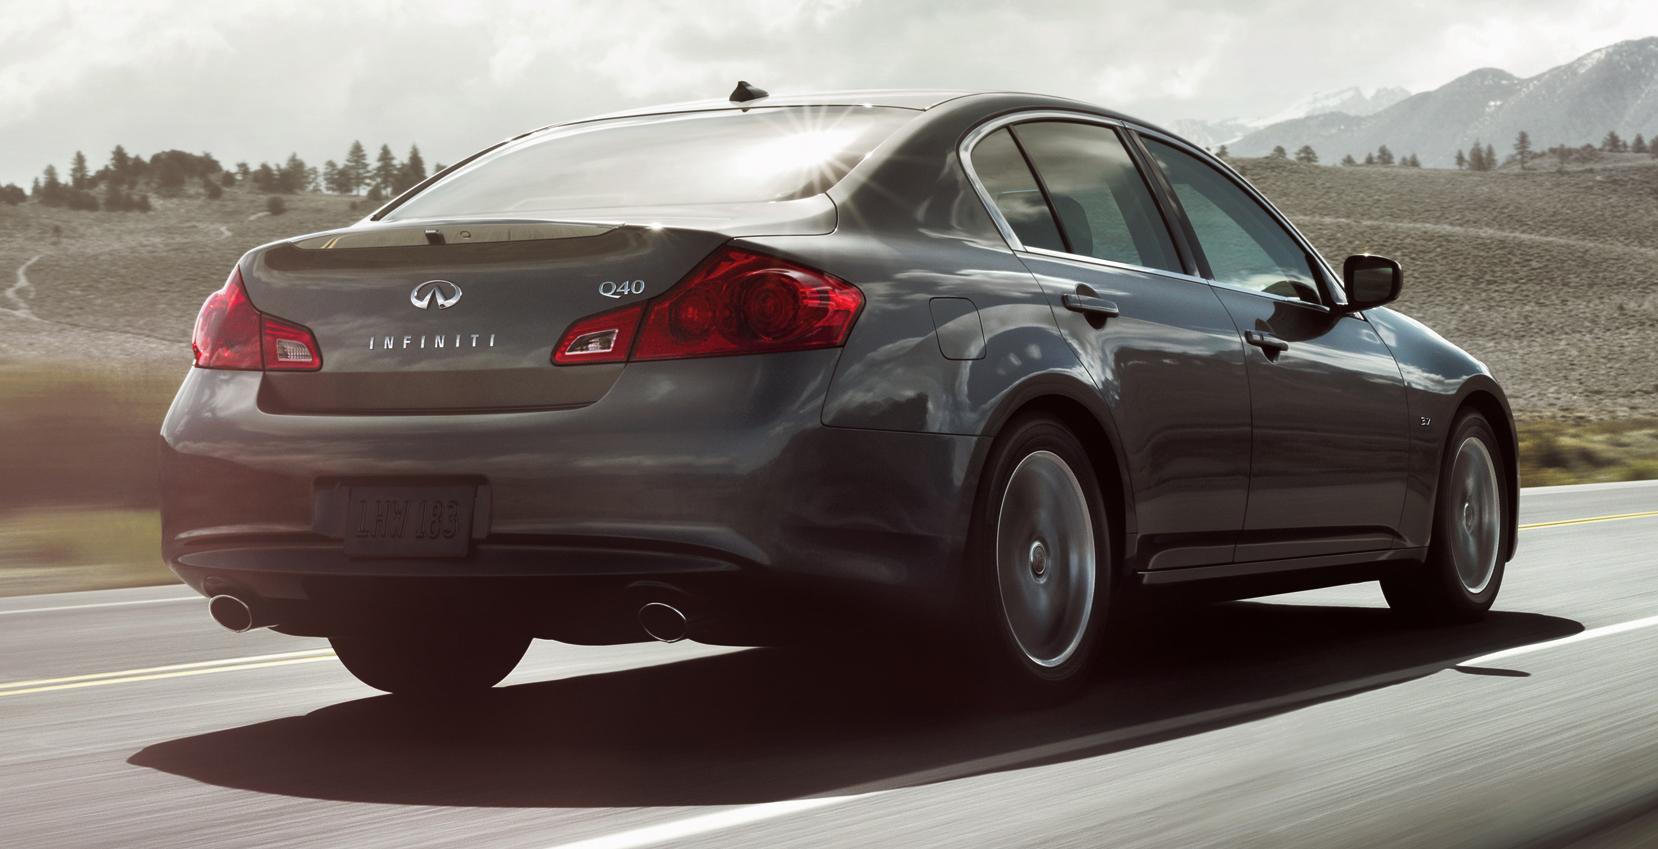 New Infiniti Q40 Last Generation G Sedan Lives On Image